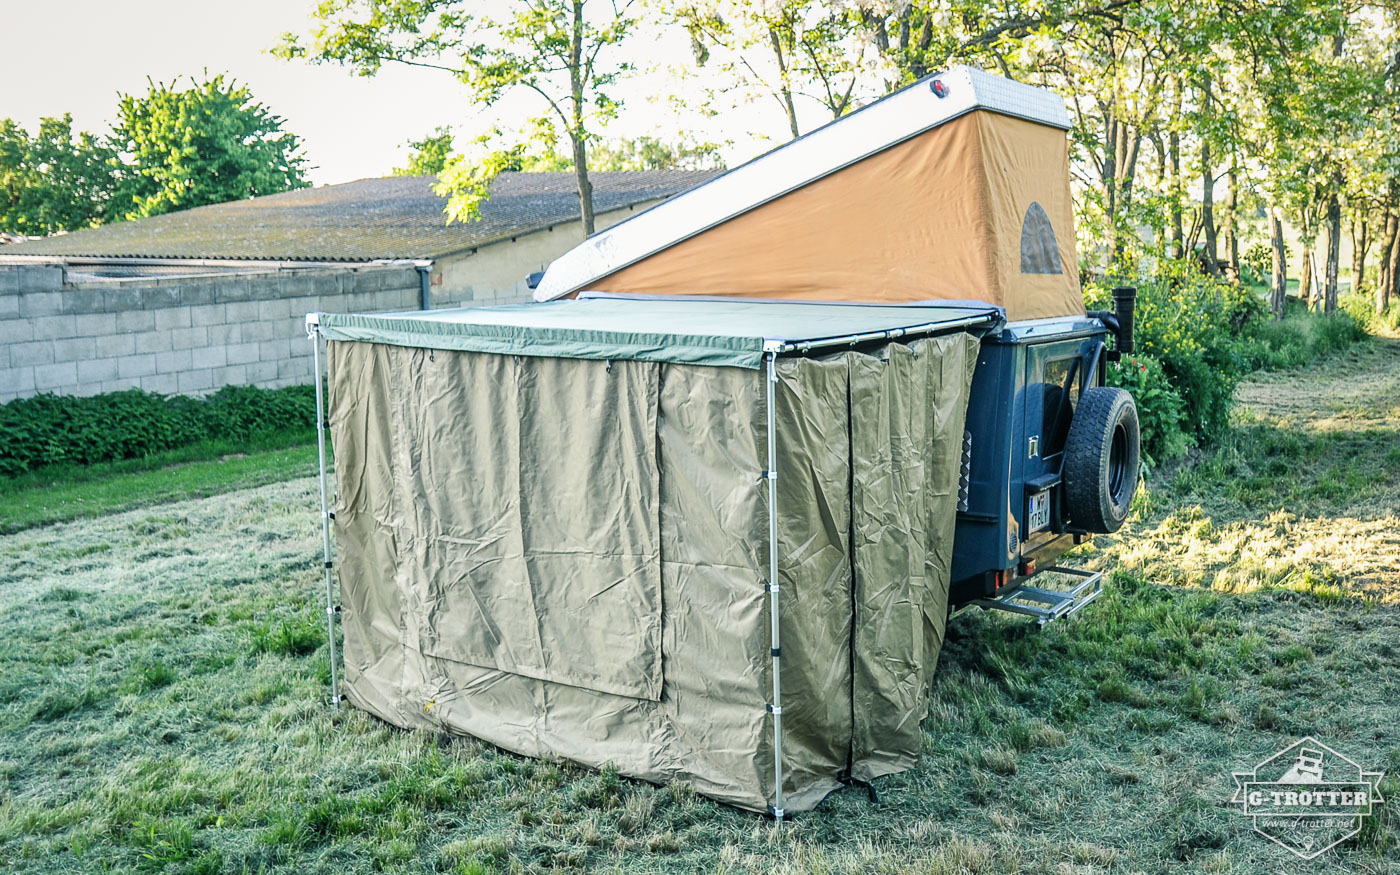 ... Gumtree Tent Room (3.jpg) & Equipment: Gordigear Gumtree Tent Room